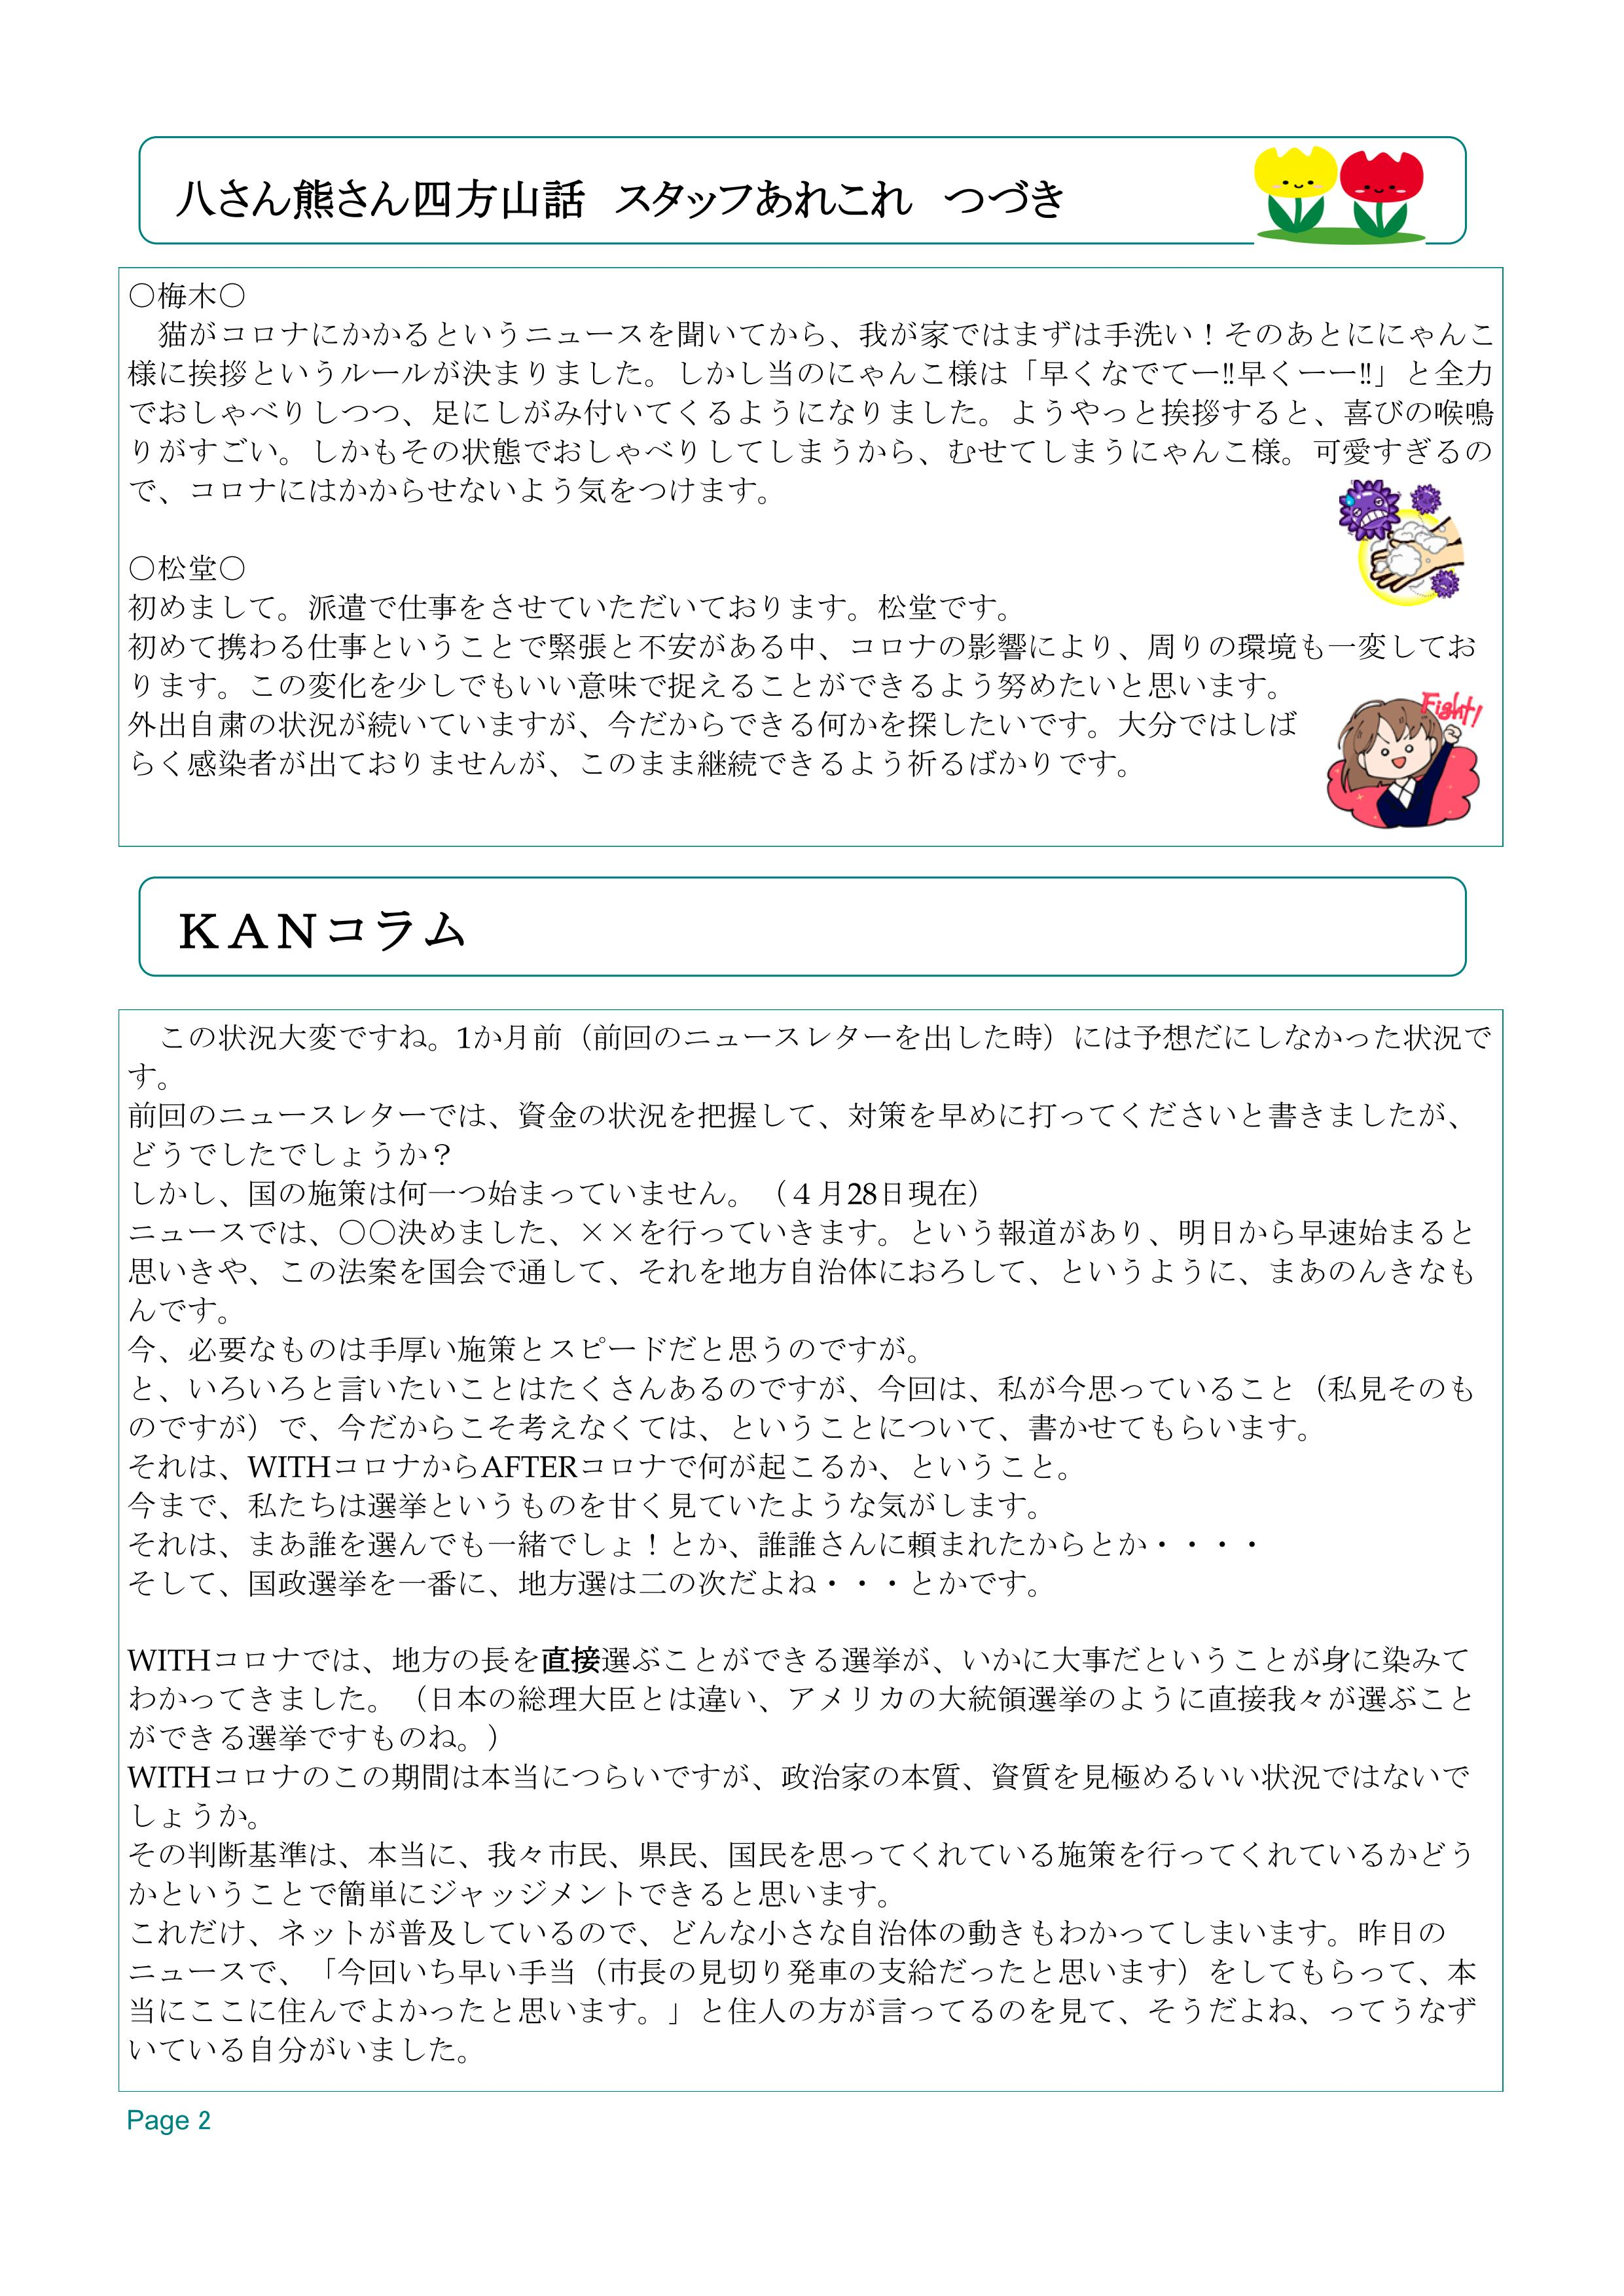 NLR2.05_02.jpg